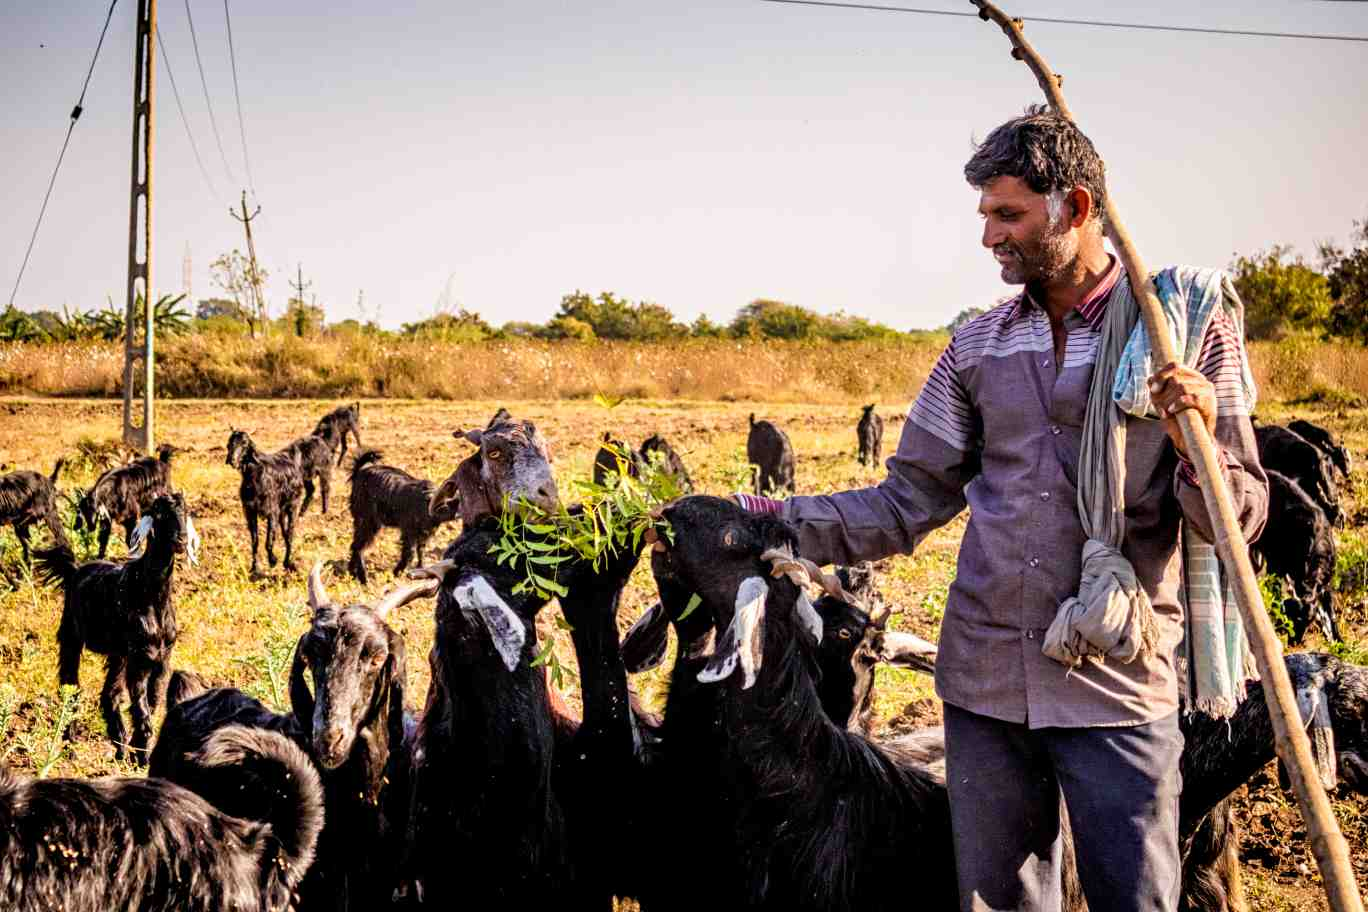 Pastoralist grazing goat_pastoral community